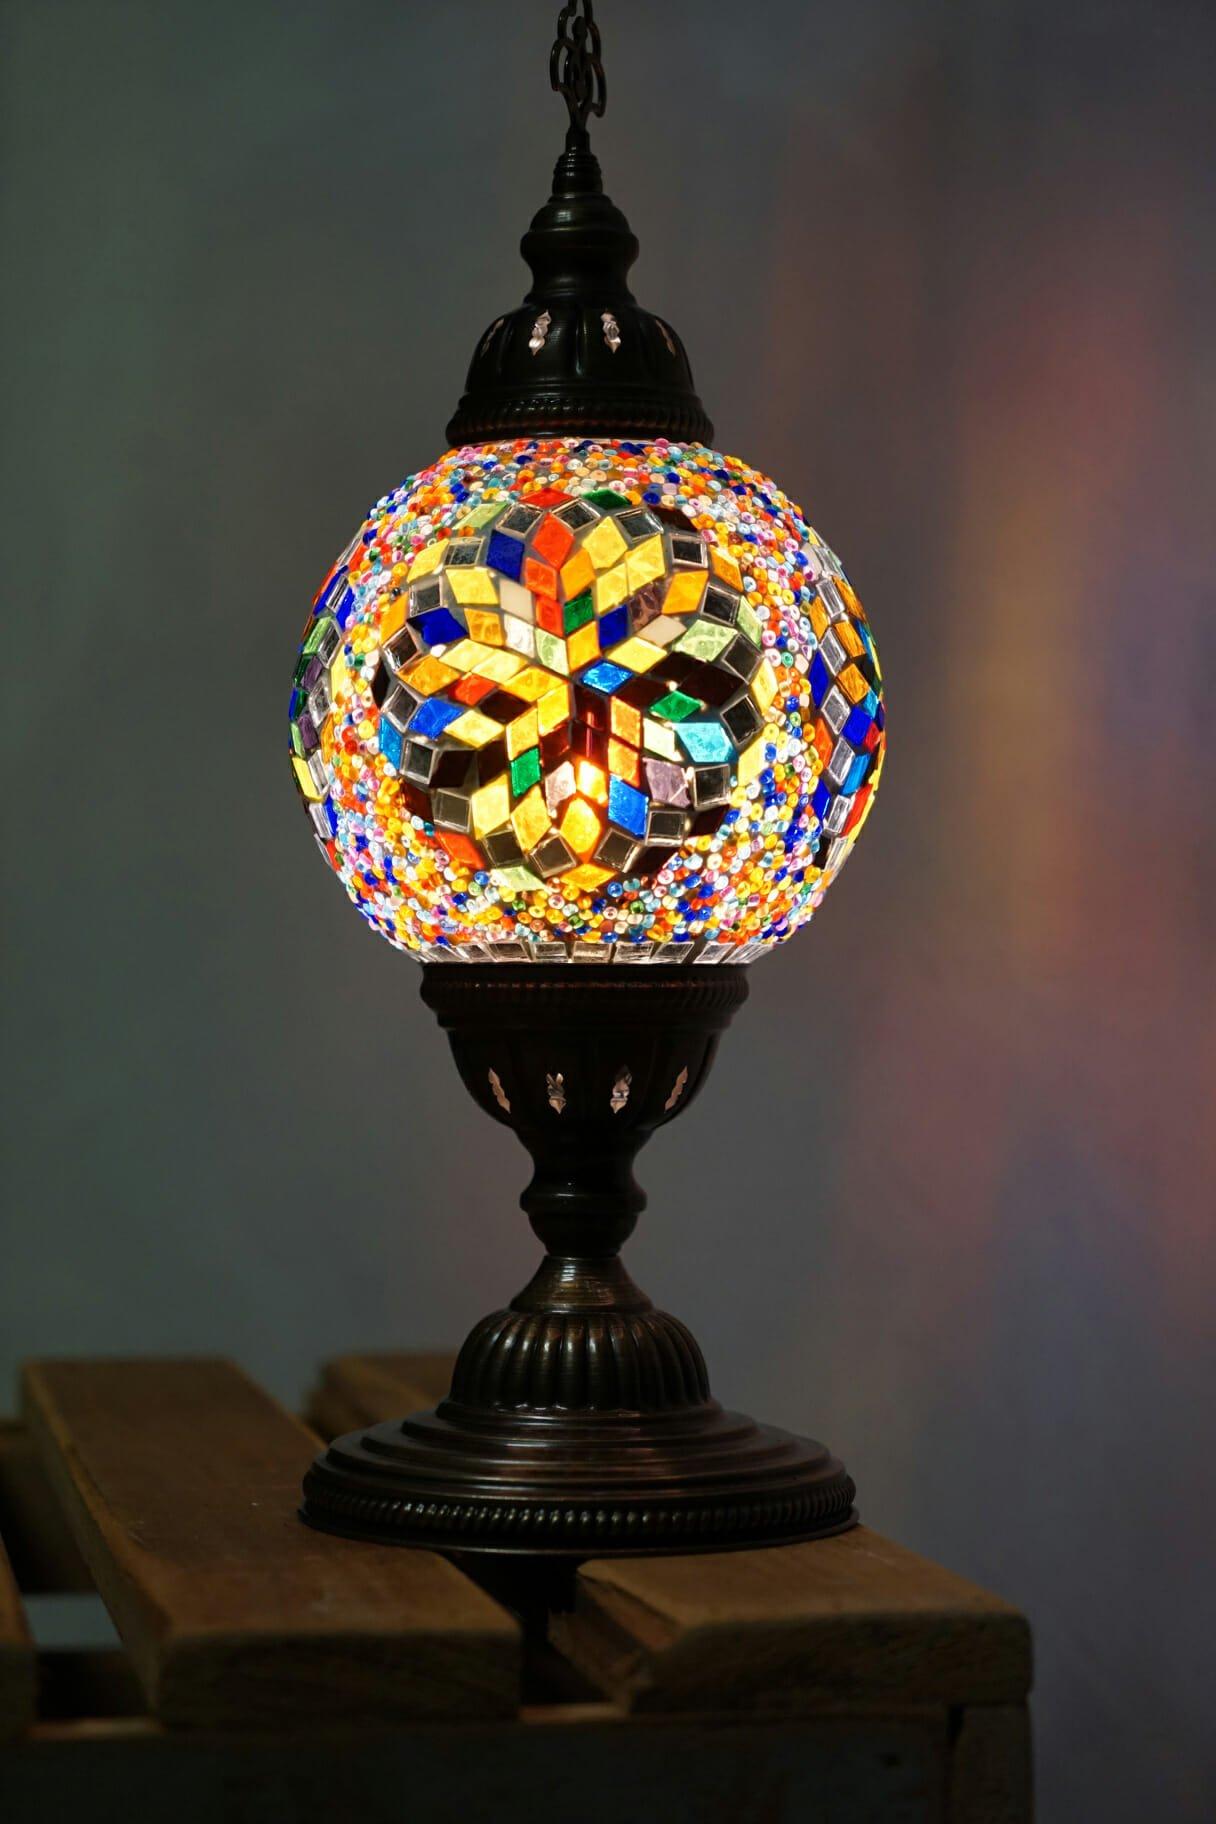 Snowflake Multi Coloured Globe Table Lamp The Dancing Pixie